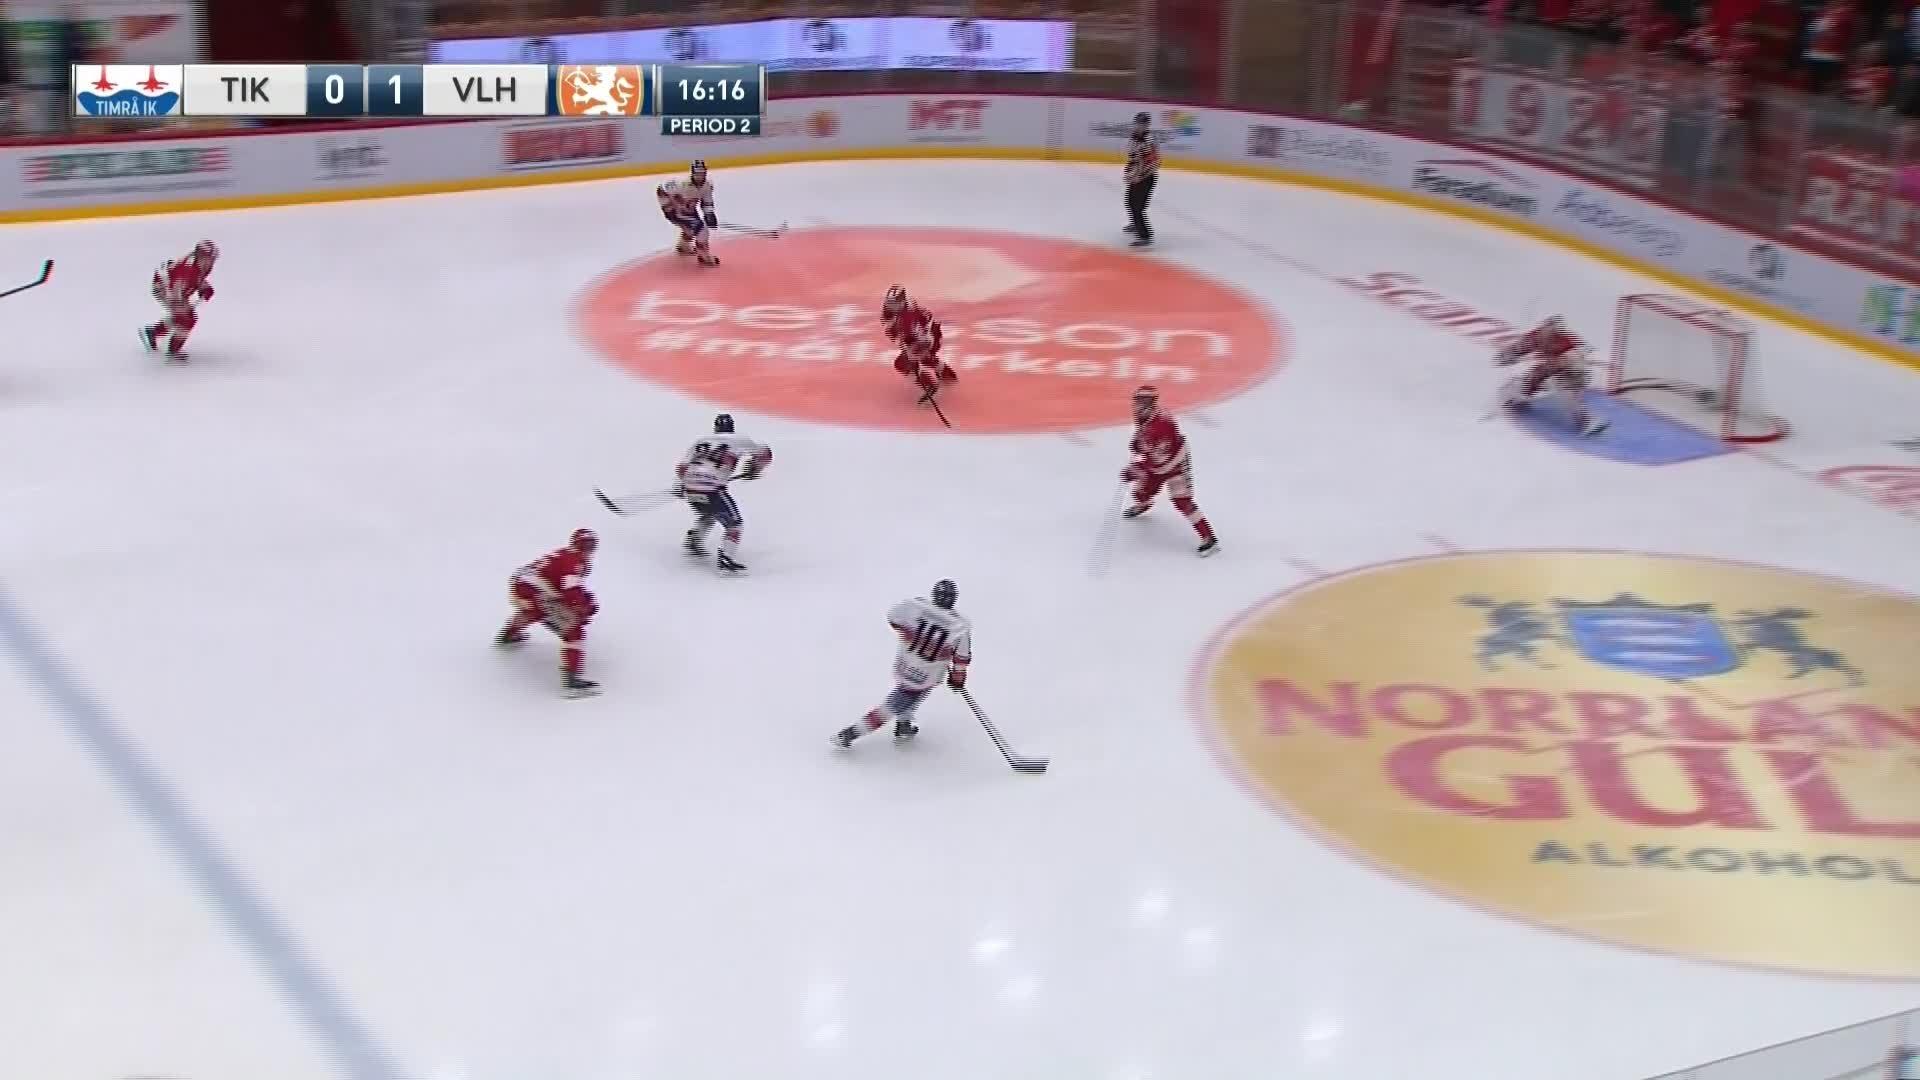 Timrå IK - Växjö Lakers 0-2